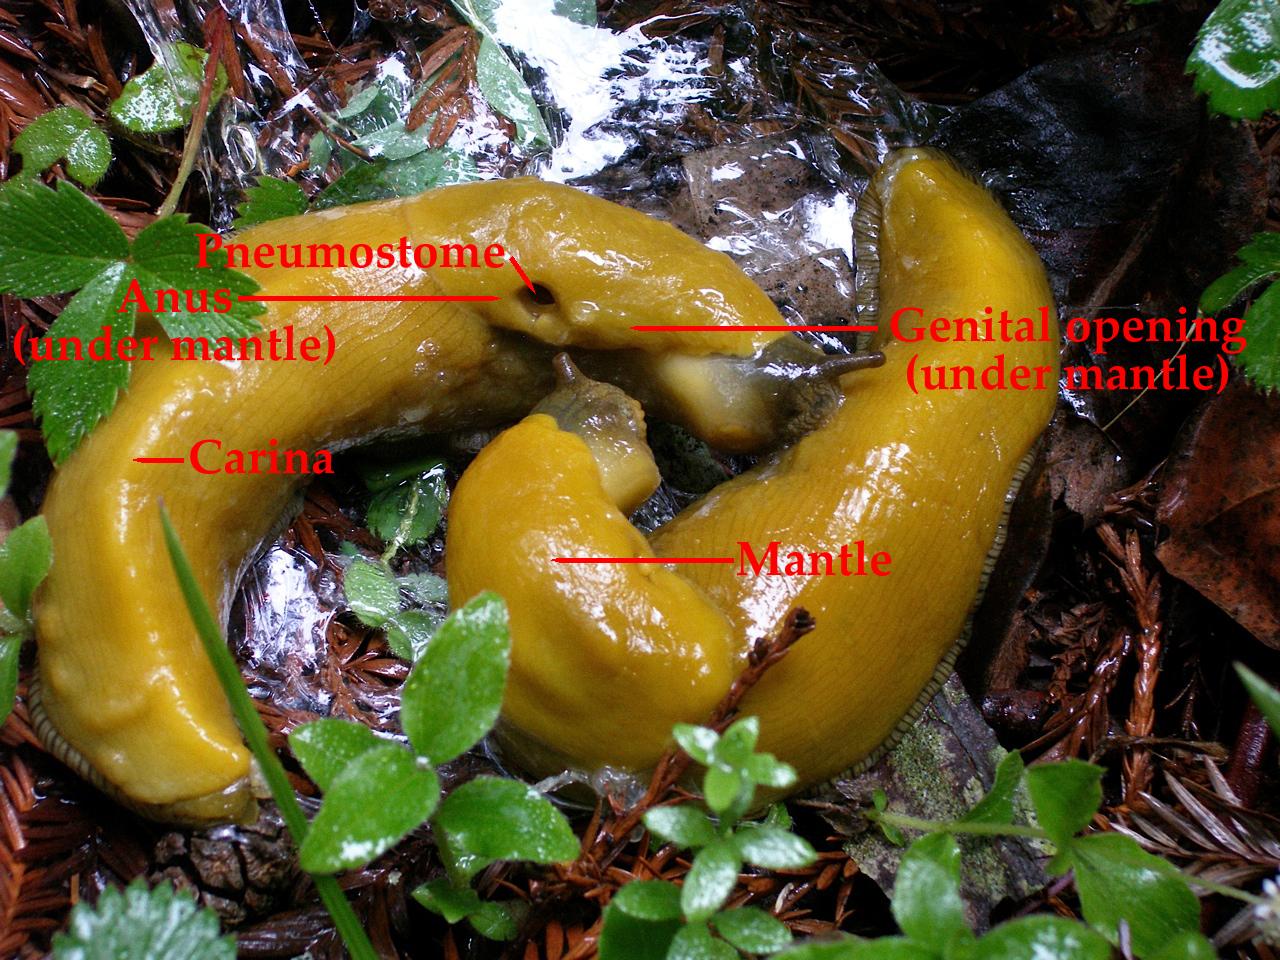 Morfologia della lumaca della banana.